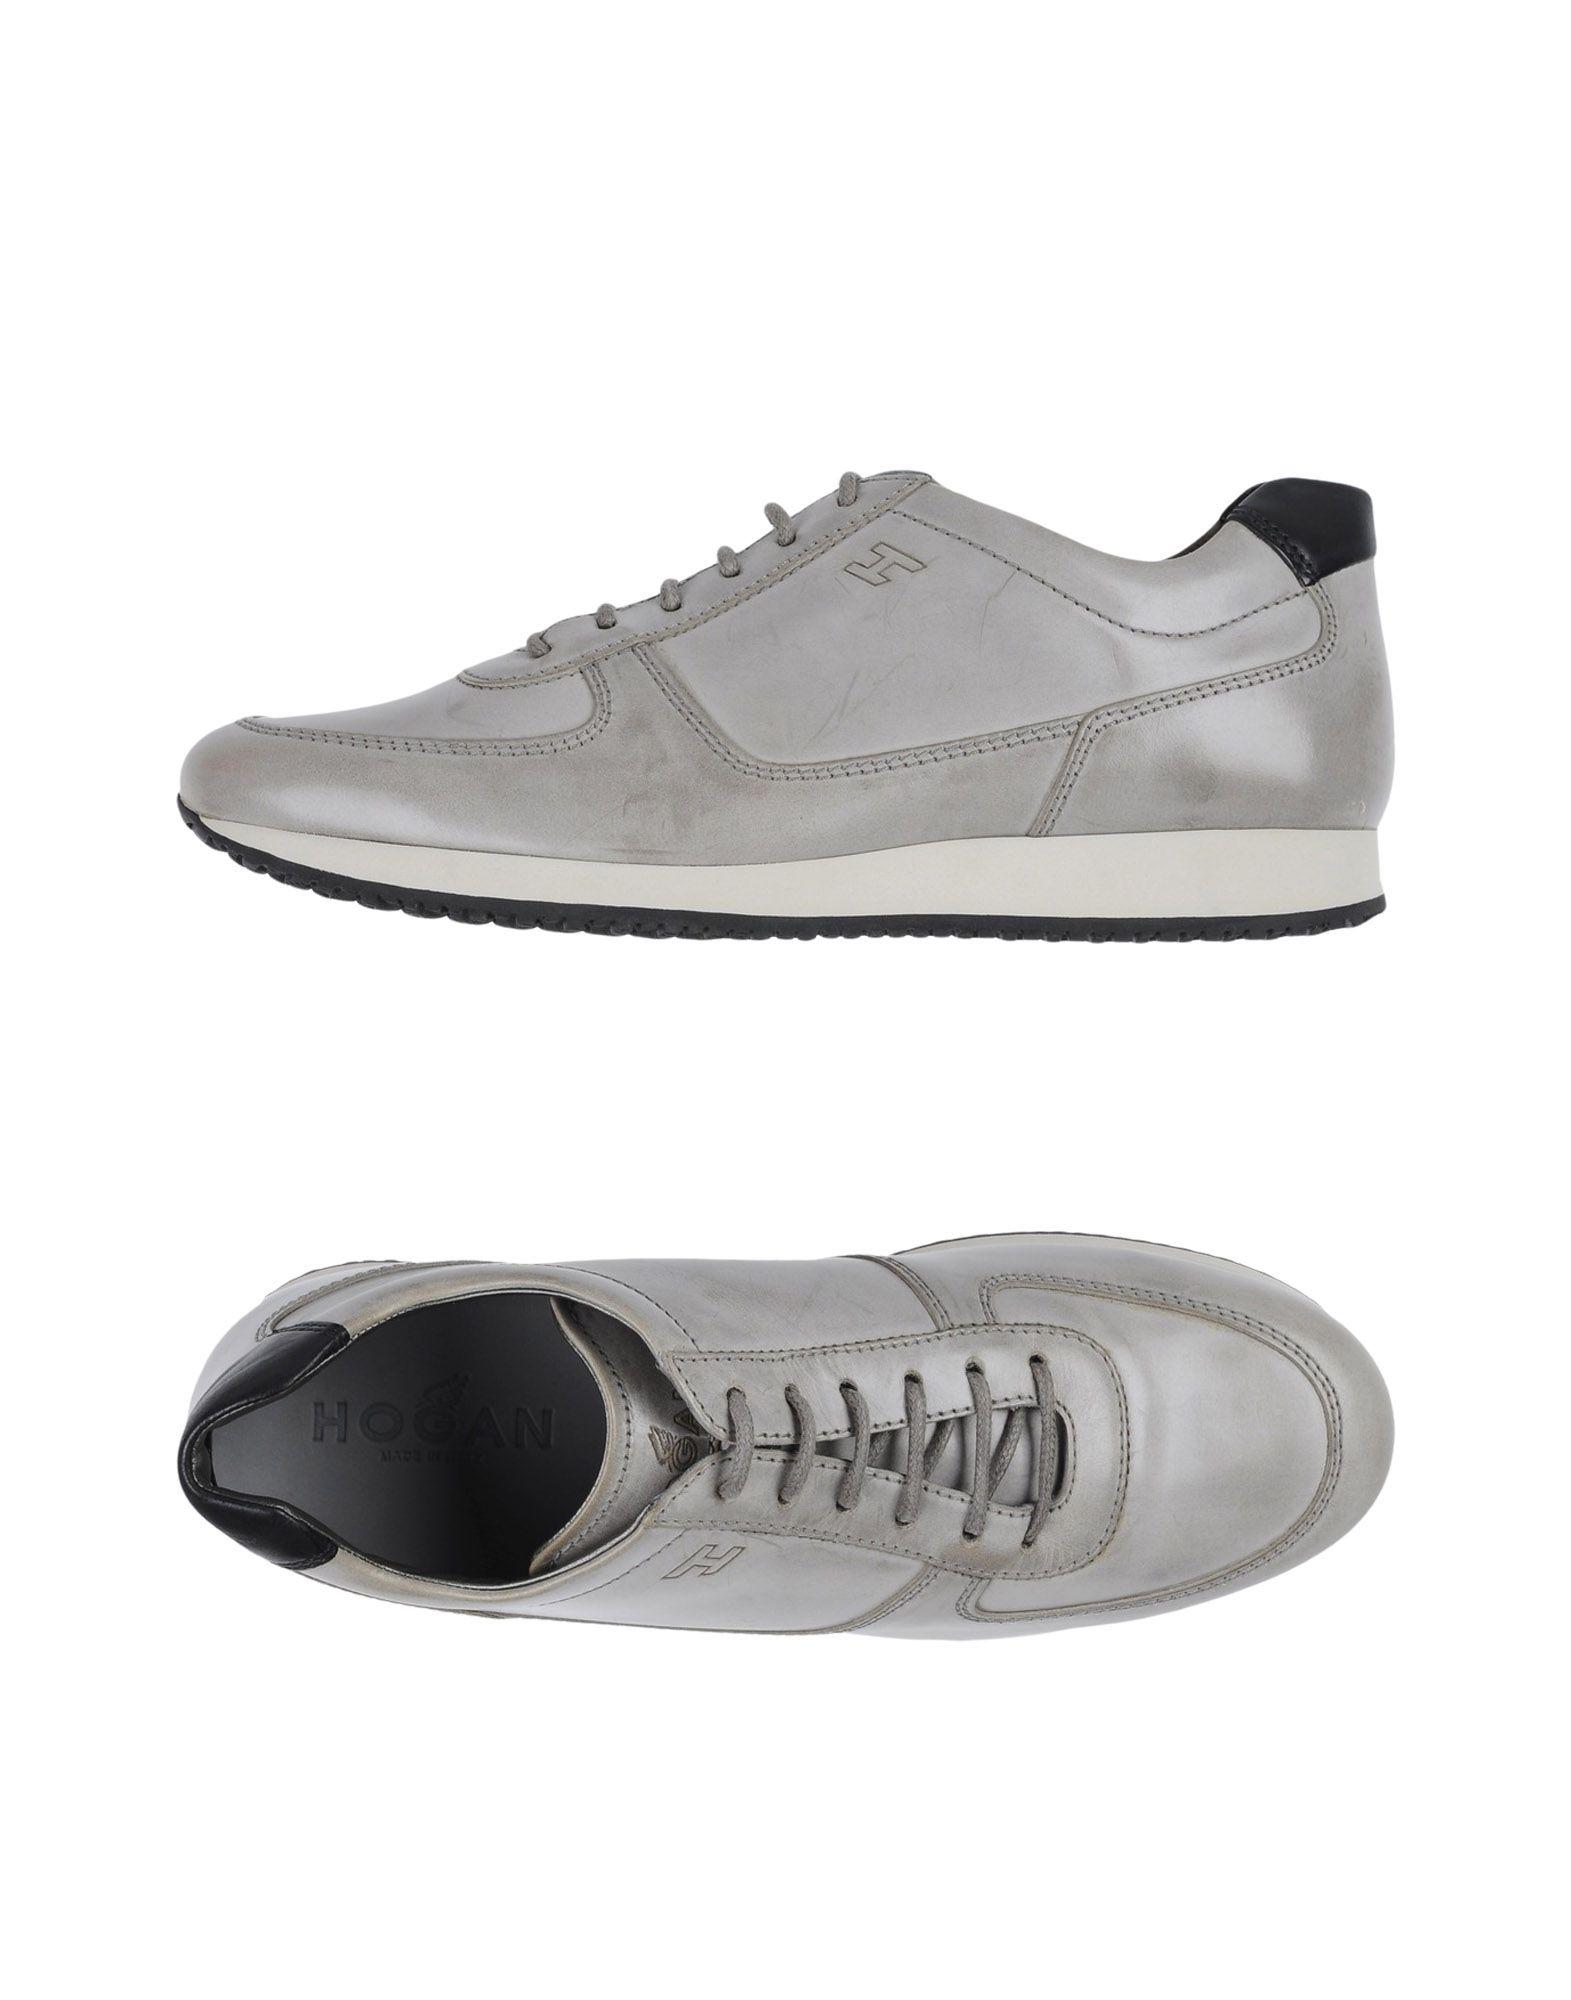 Hogan Sneakers Herren  11335523KC Gute Qualität beliebte Schuhe